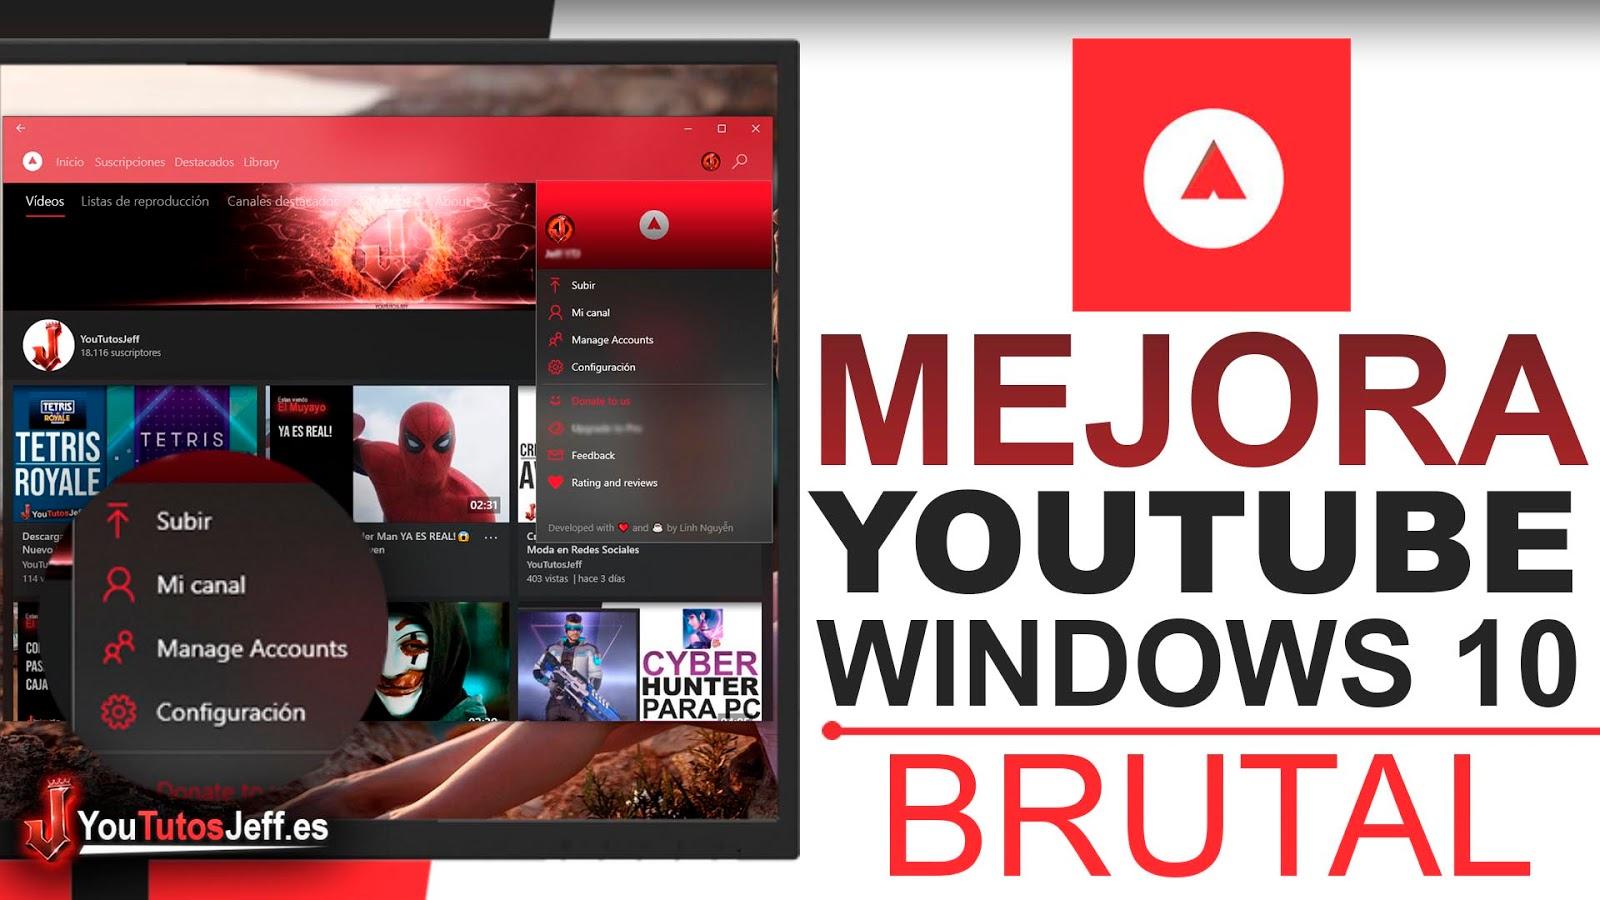 El Mejor Youtube para Windows 10, Descargar Awesome Tube Gratis